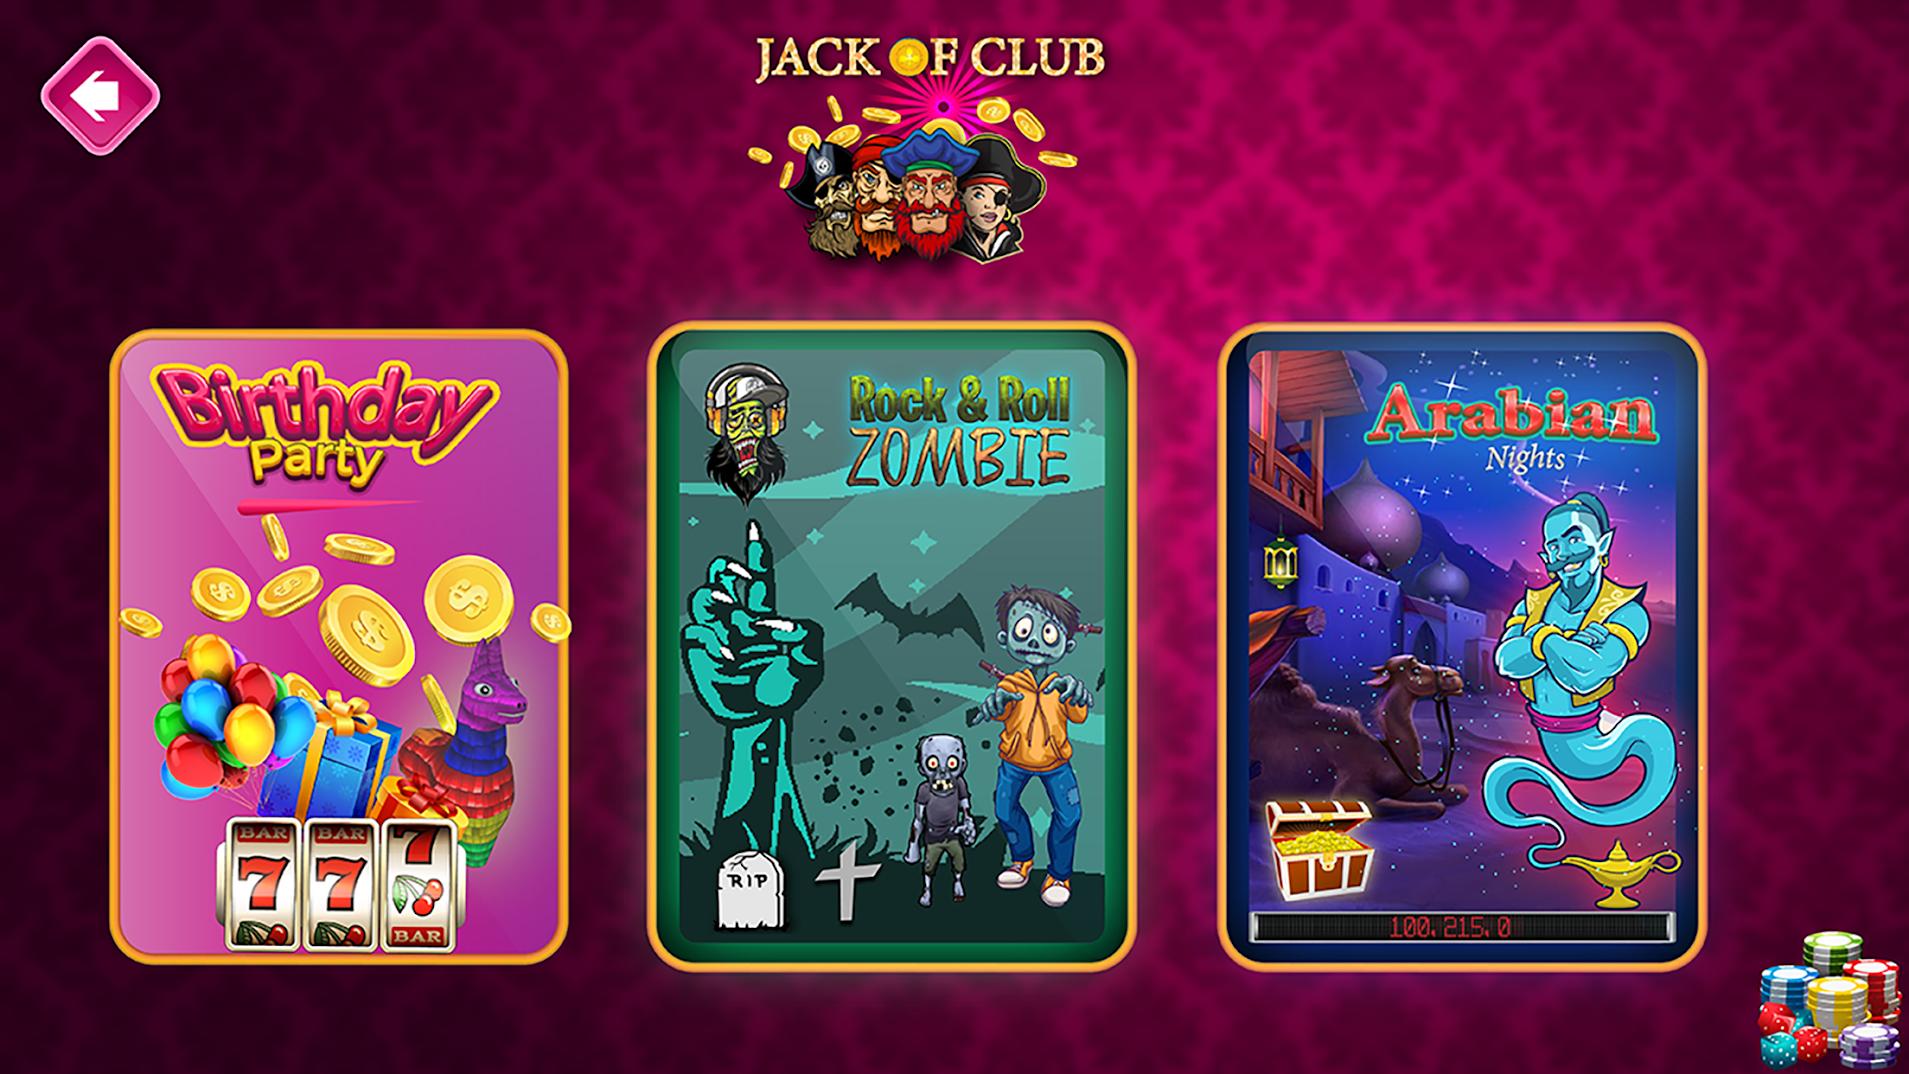 Jack of Club